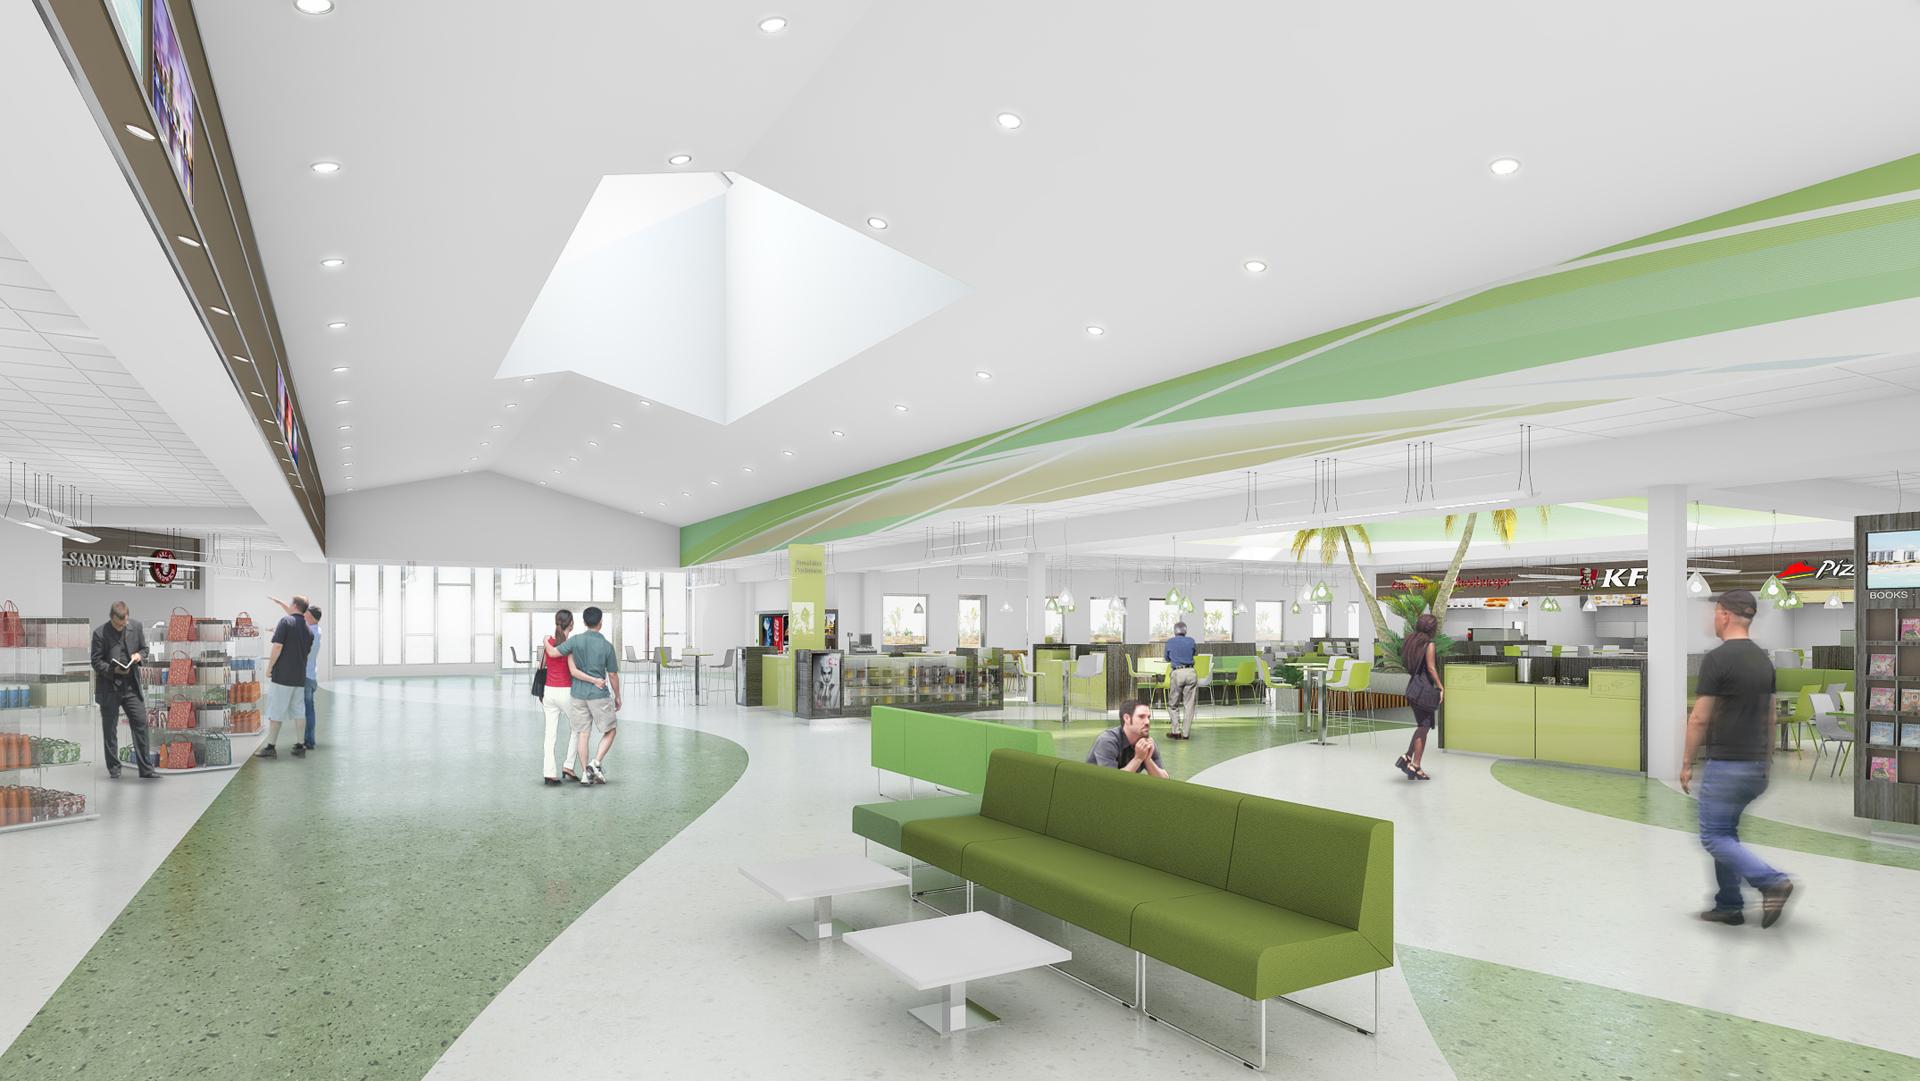 West Palm Beach Food Court